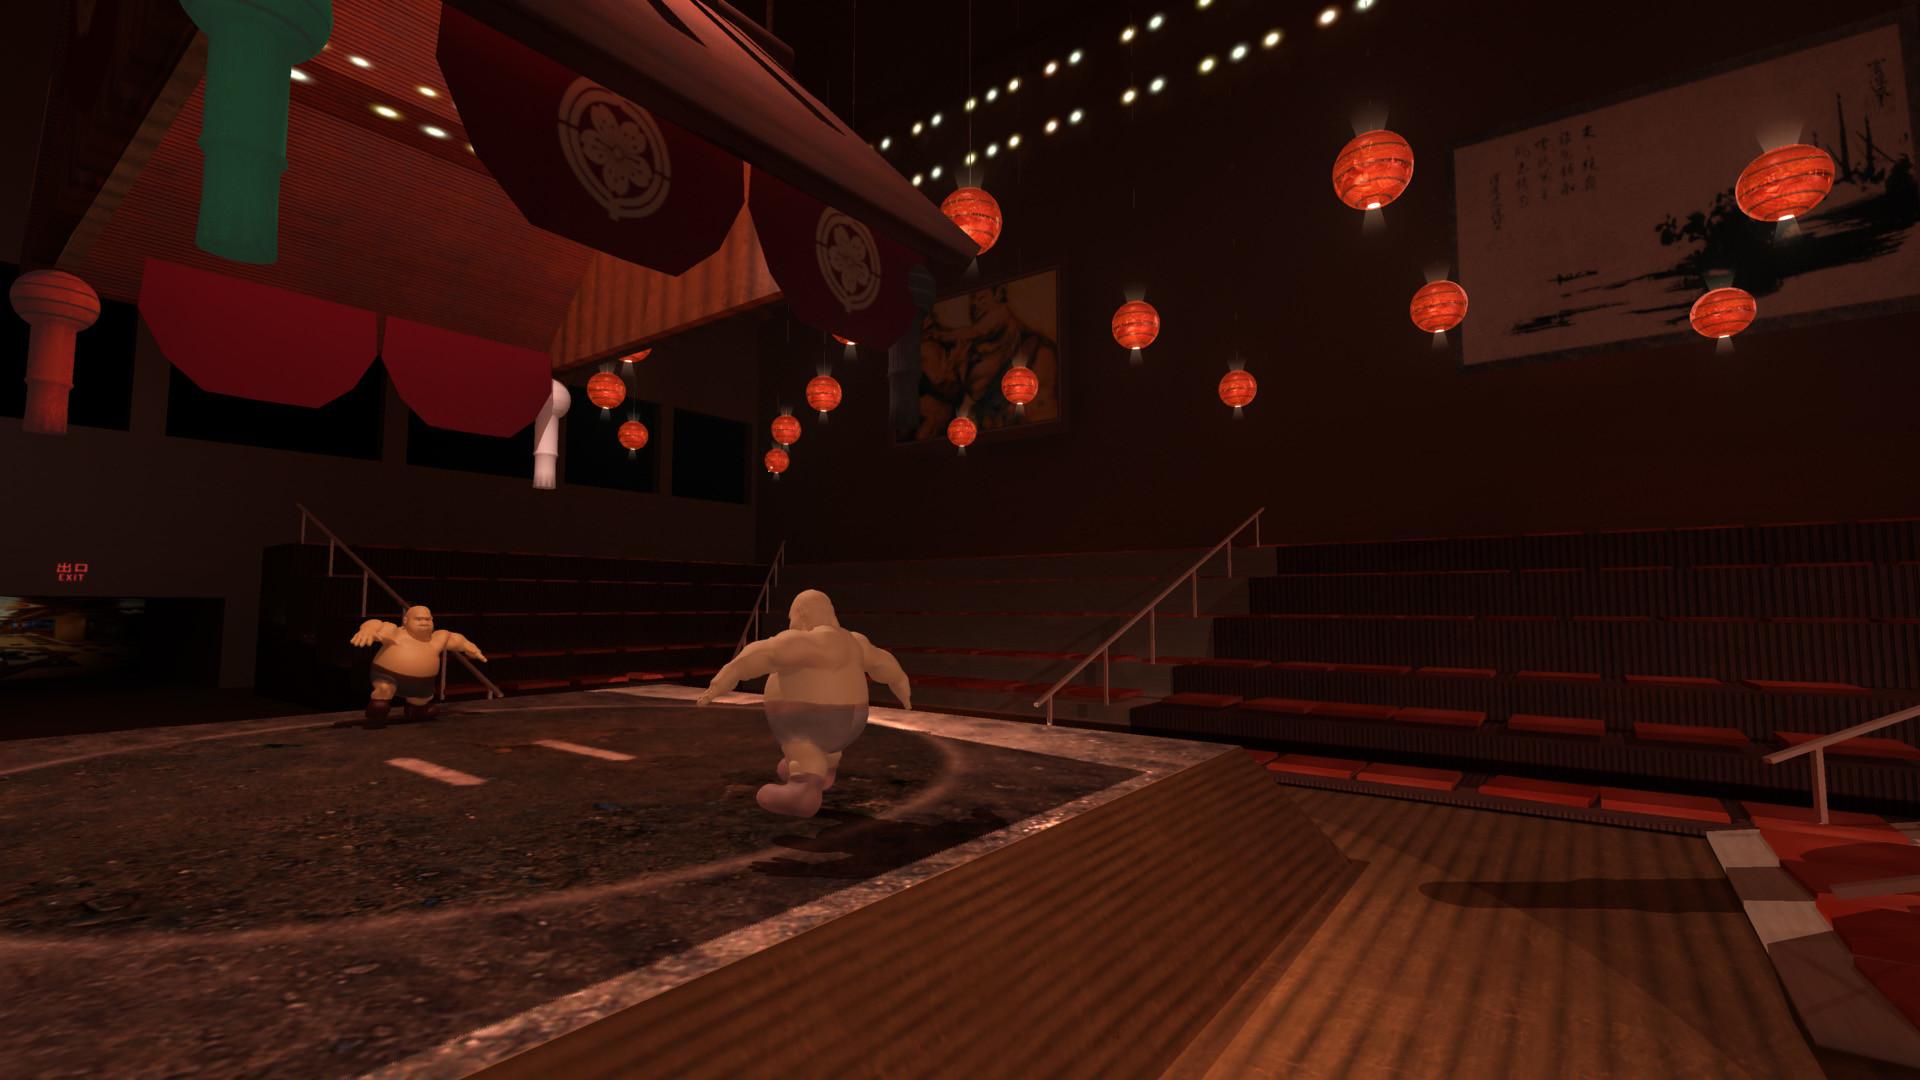 Wrestling Ring Wallpaper Sumo wrestling ring by